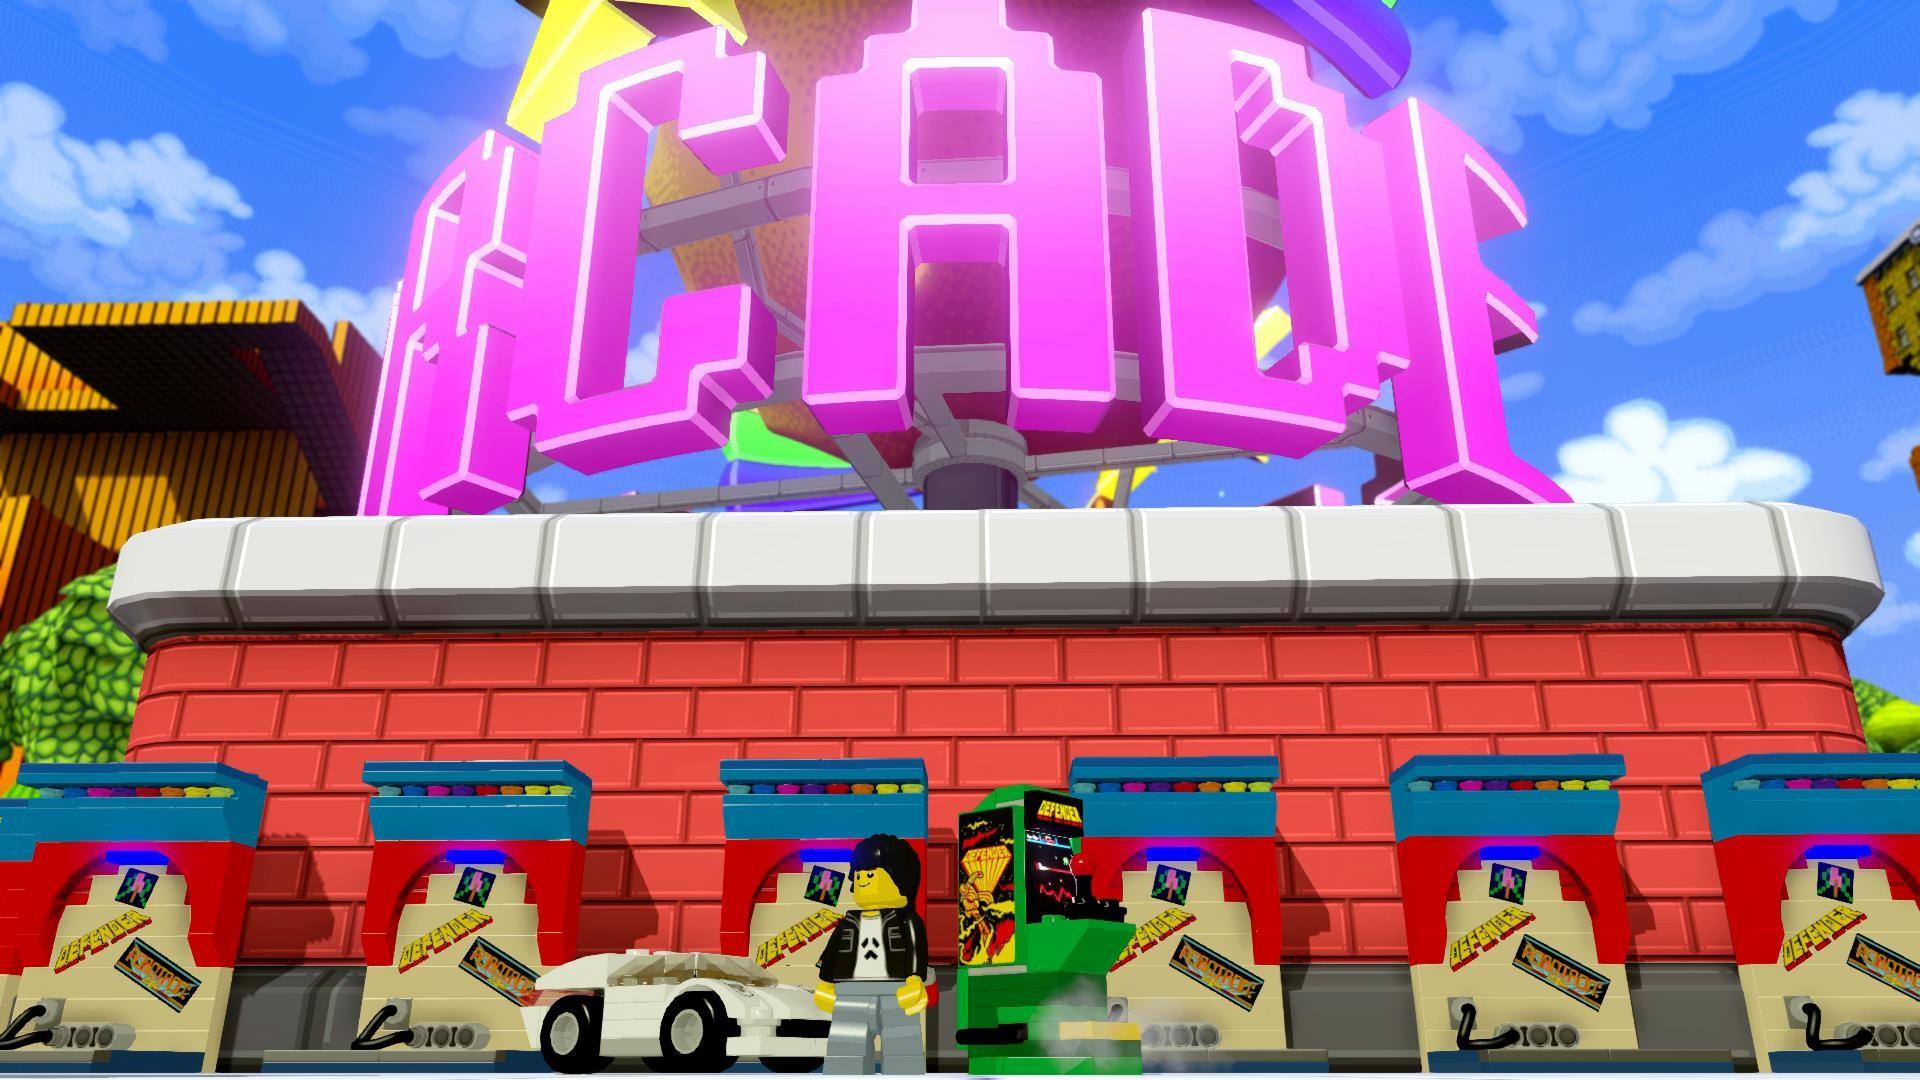 LEGO_Dimensions_Gamer_Kid_12_bmp_jpgcopy